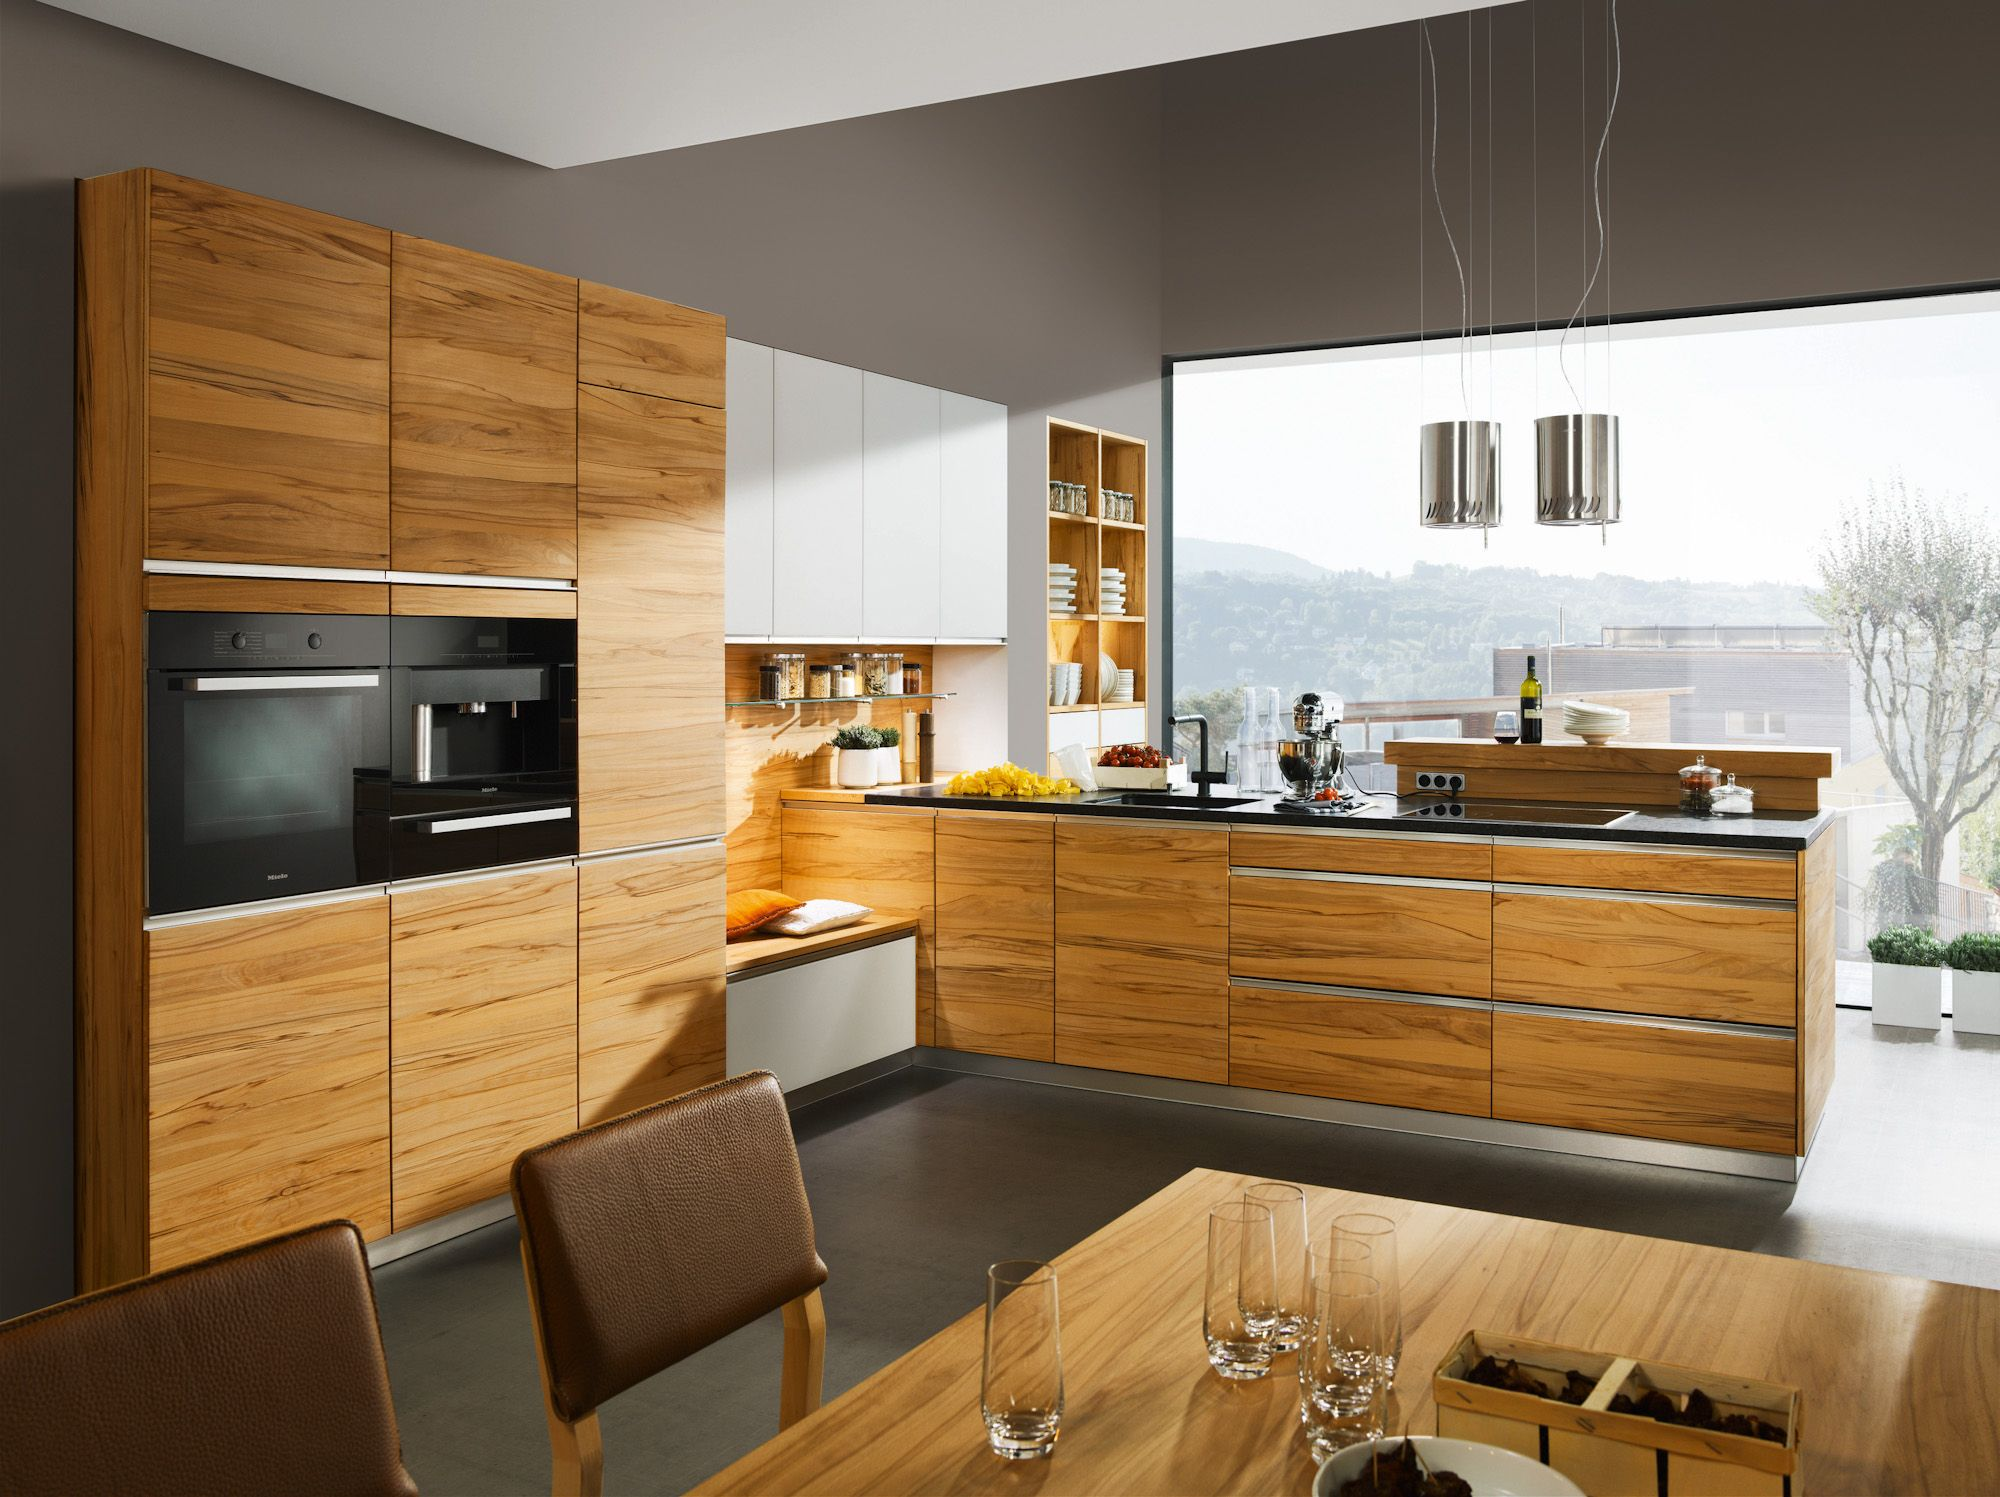 Küche | Kernbuche massiv | geölt | modern | Wohnküche | grifflos ...